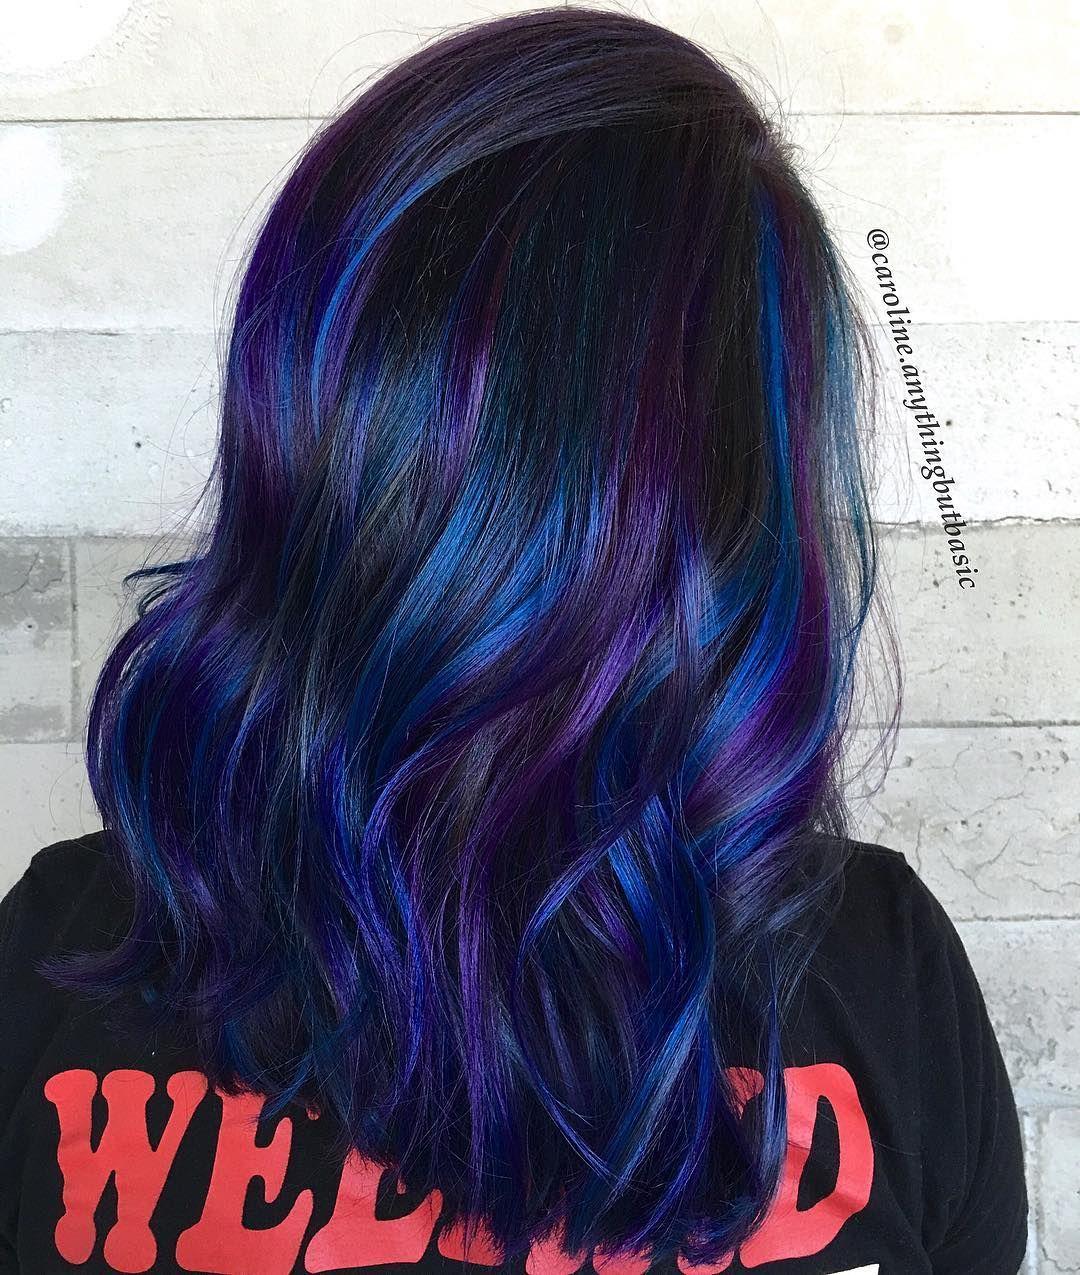 Hair Color Blue And Purple Highlights Www Pixshark Com